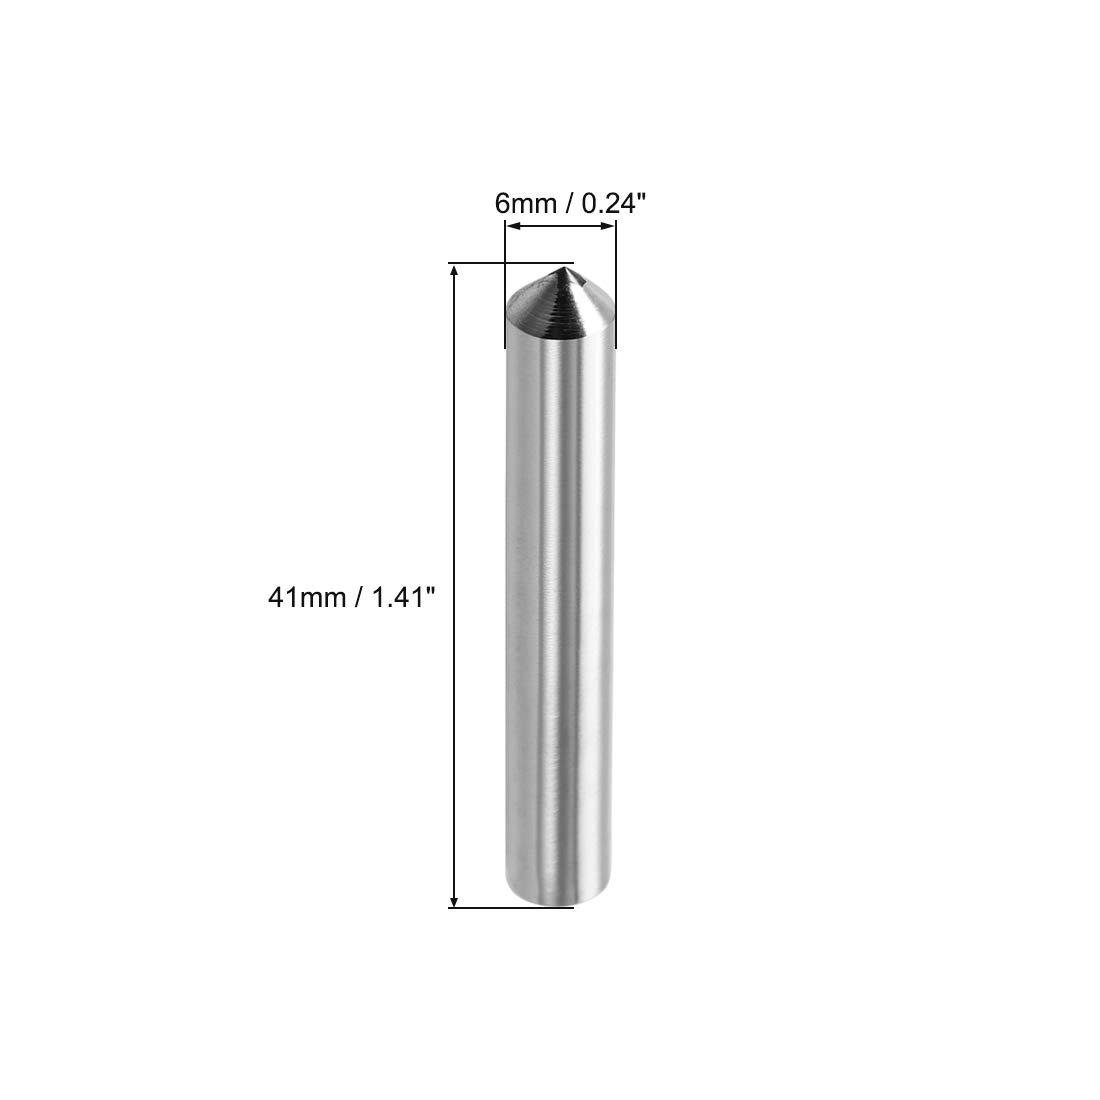 Diamond Grinding Wheel Dresser 10mm X 24mm Single Point Dressing Tool